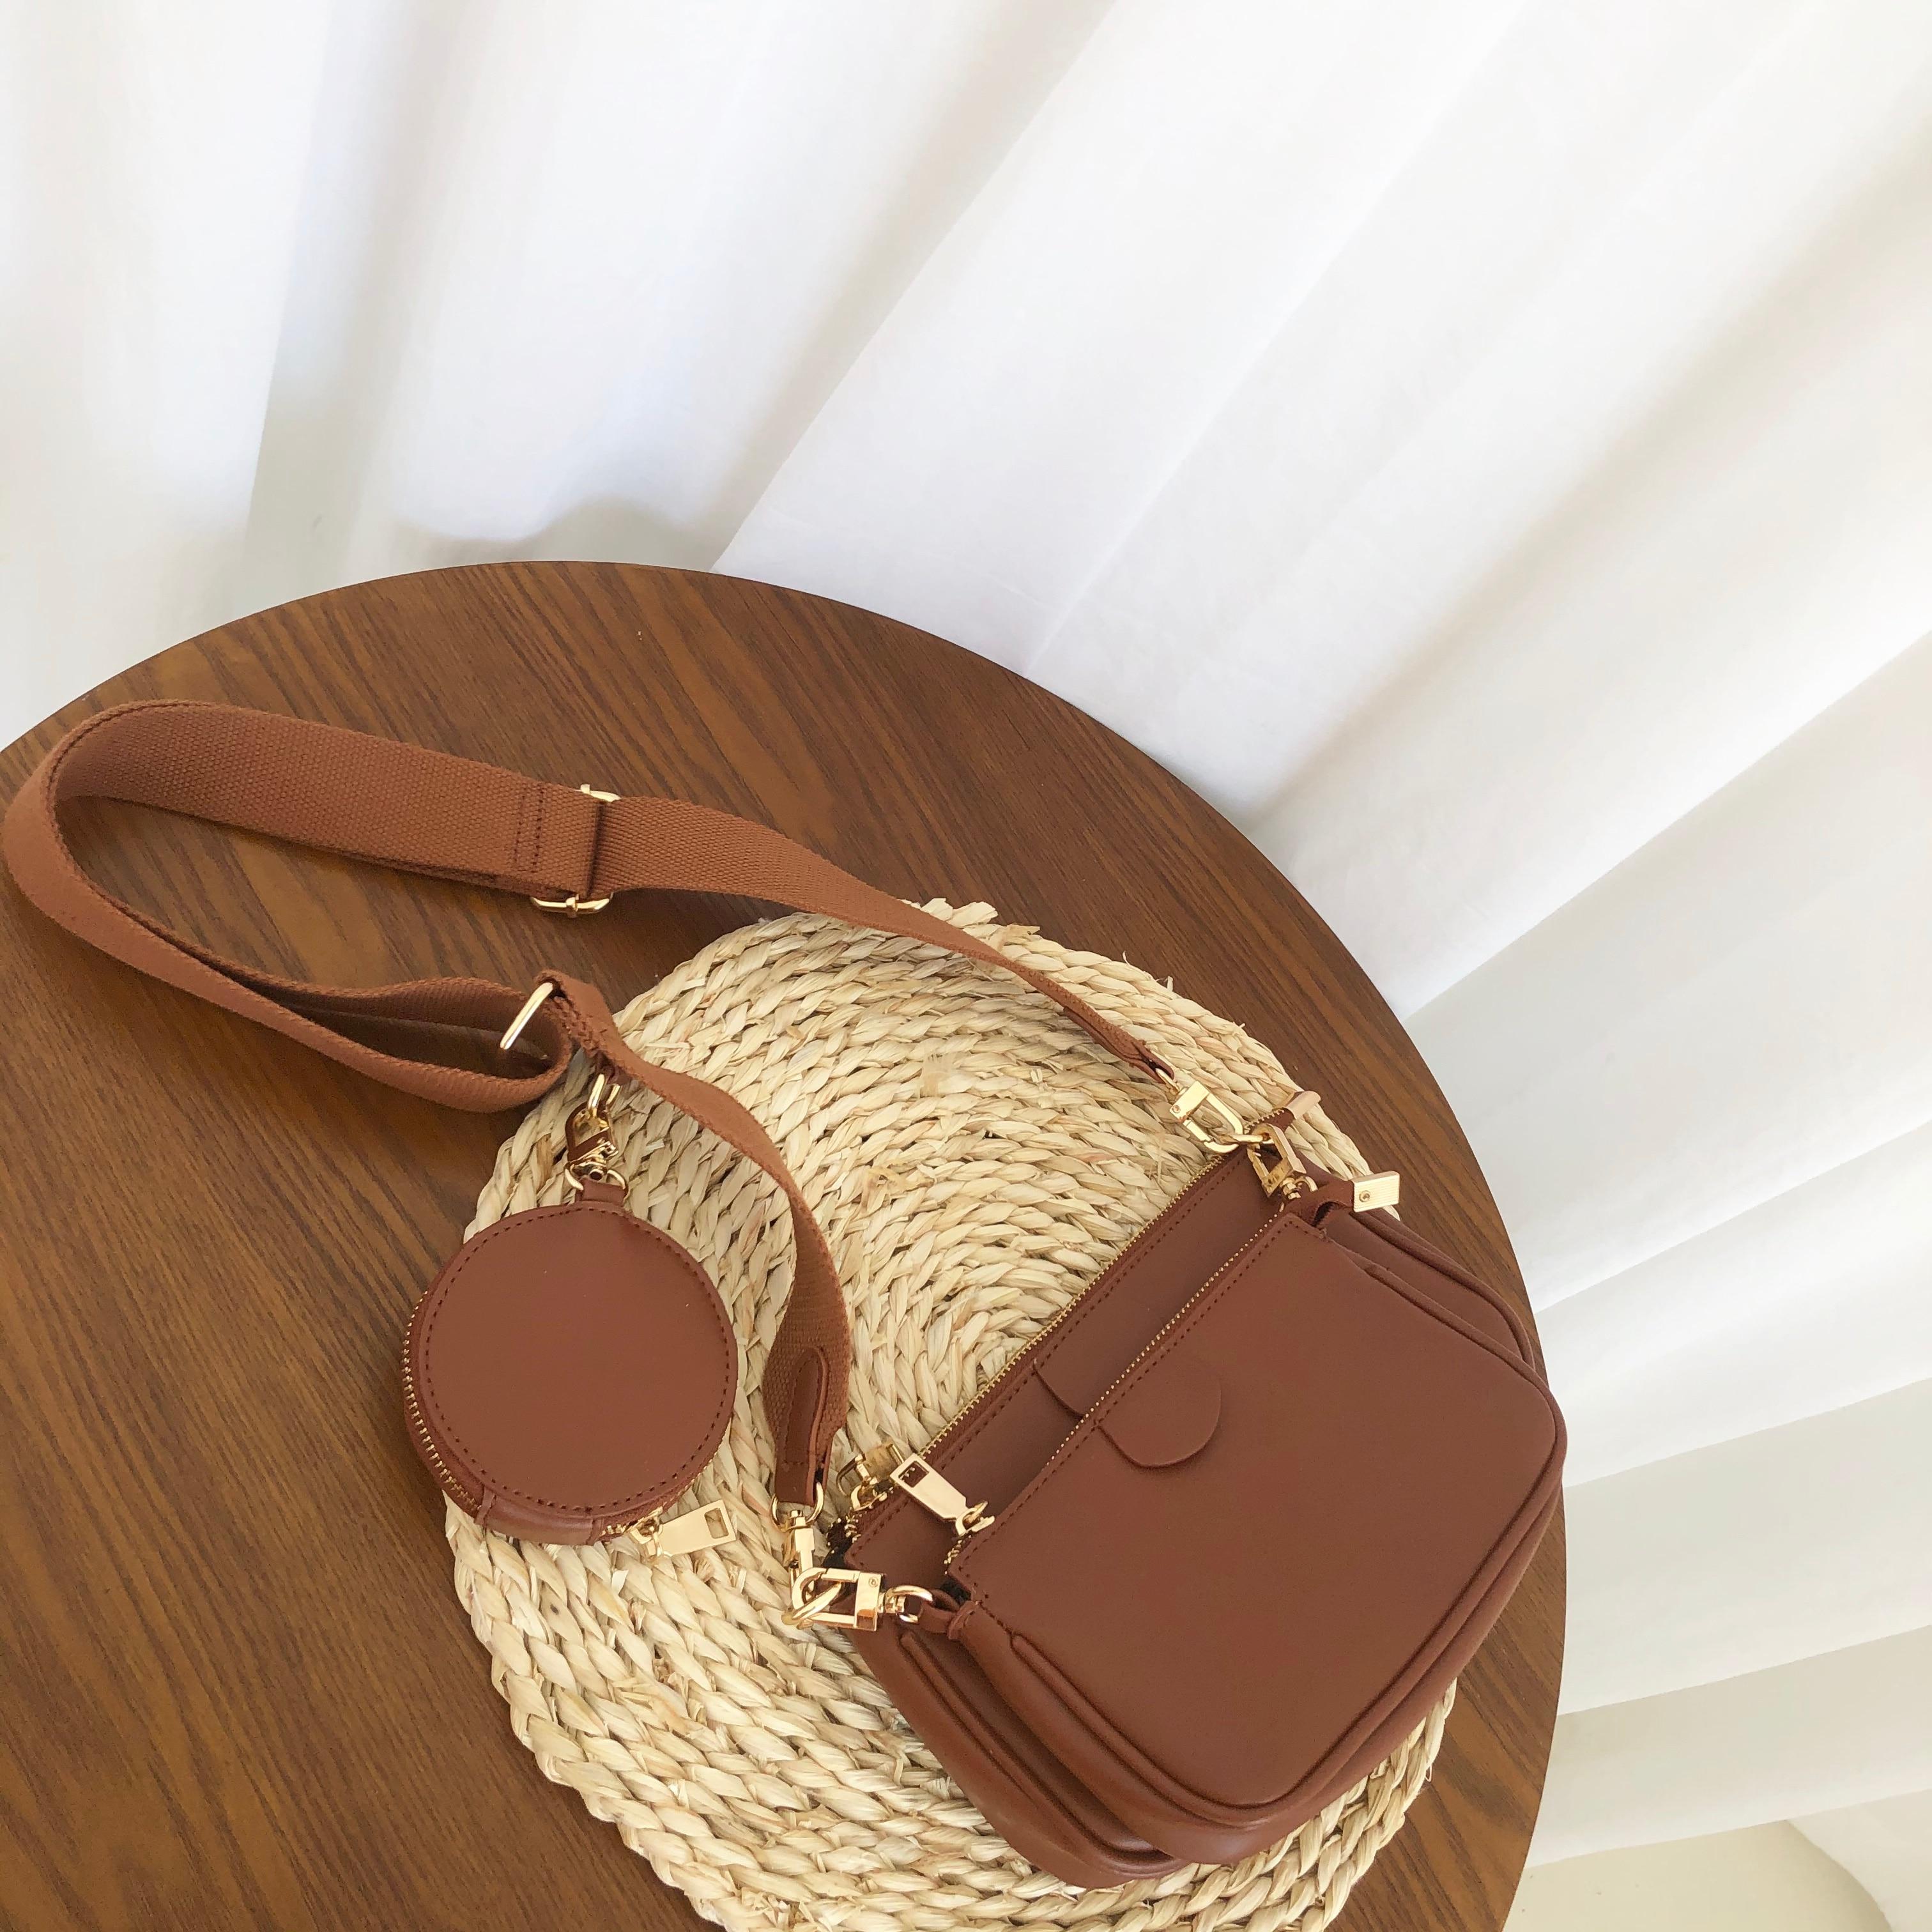 Fashion Solid Color PU Leather Shoulder Messenger Bag Casual Crossbody Bags Women Handbags Tote Bag 3 Sets Evening Clutch Purse